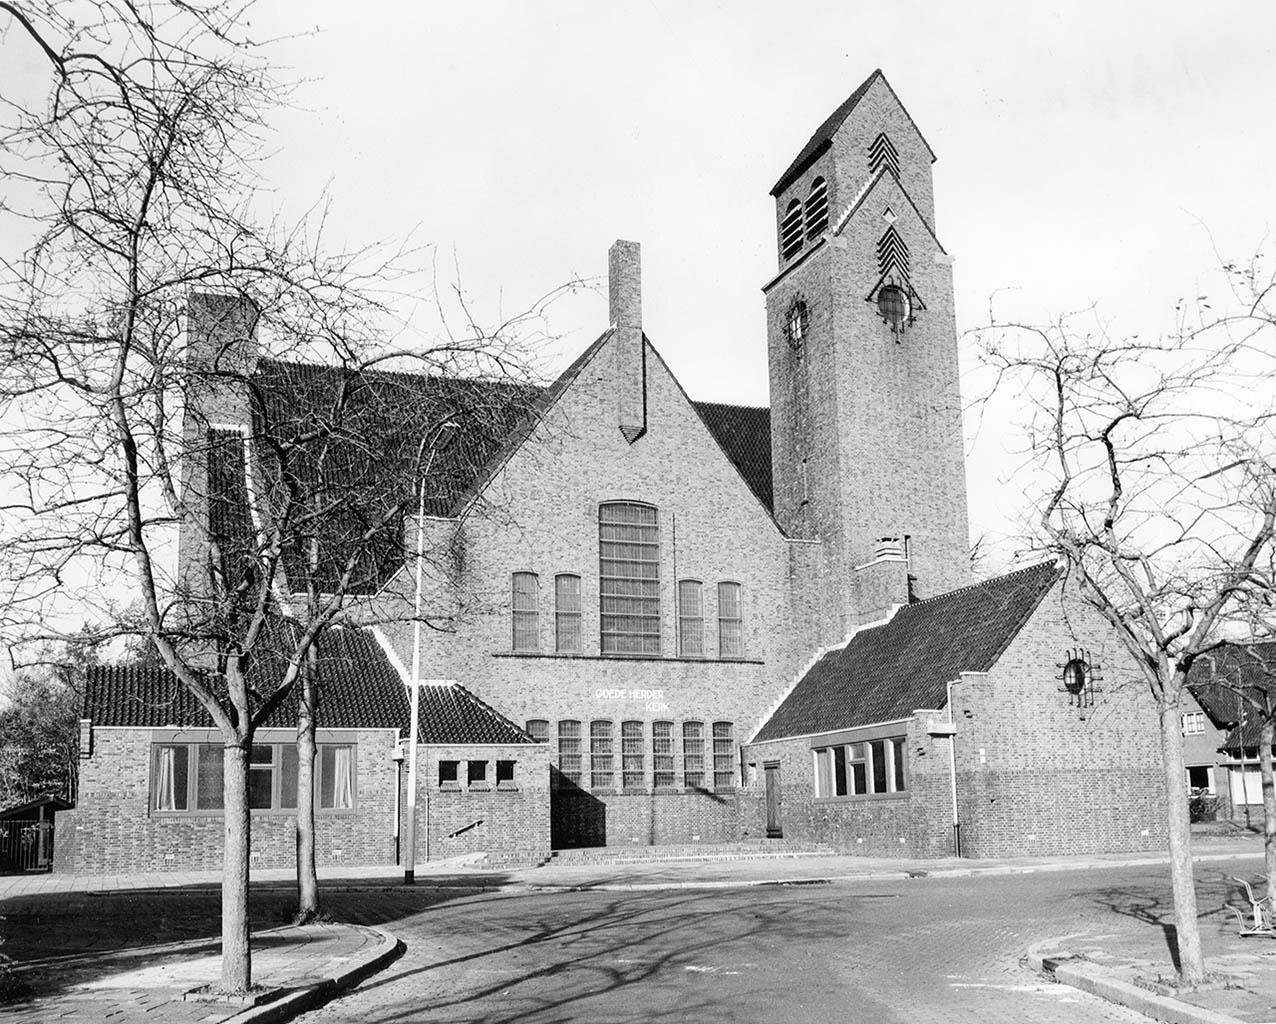 Goede Herderkerk in 1988 (Emmalaan, Bedum). Foto: Jan Hovinga, Groninger Archieven